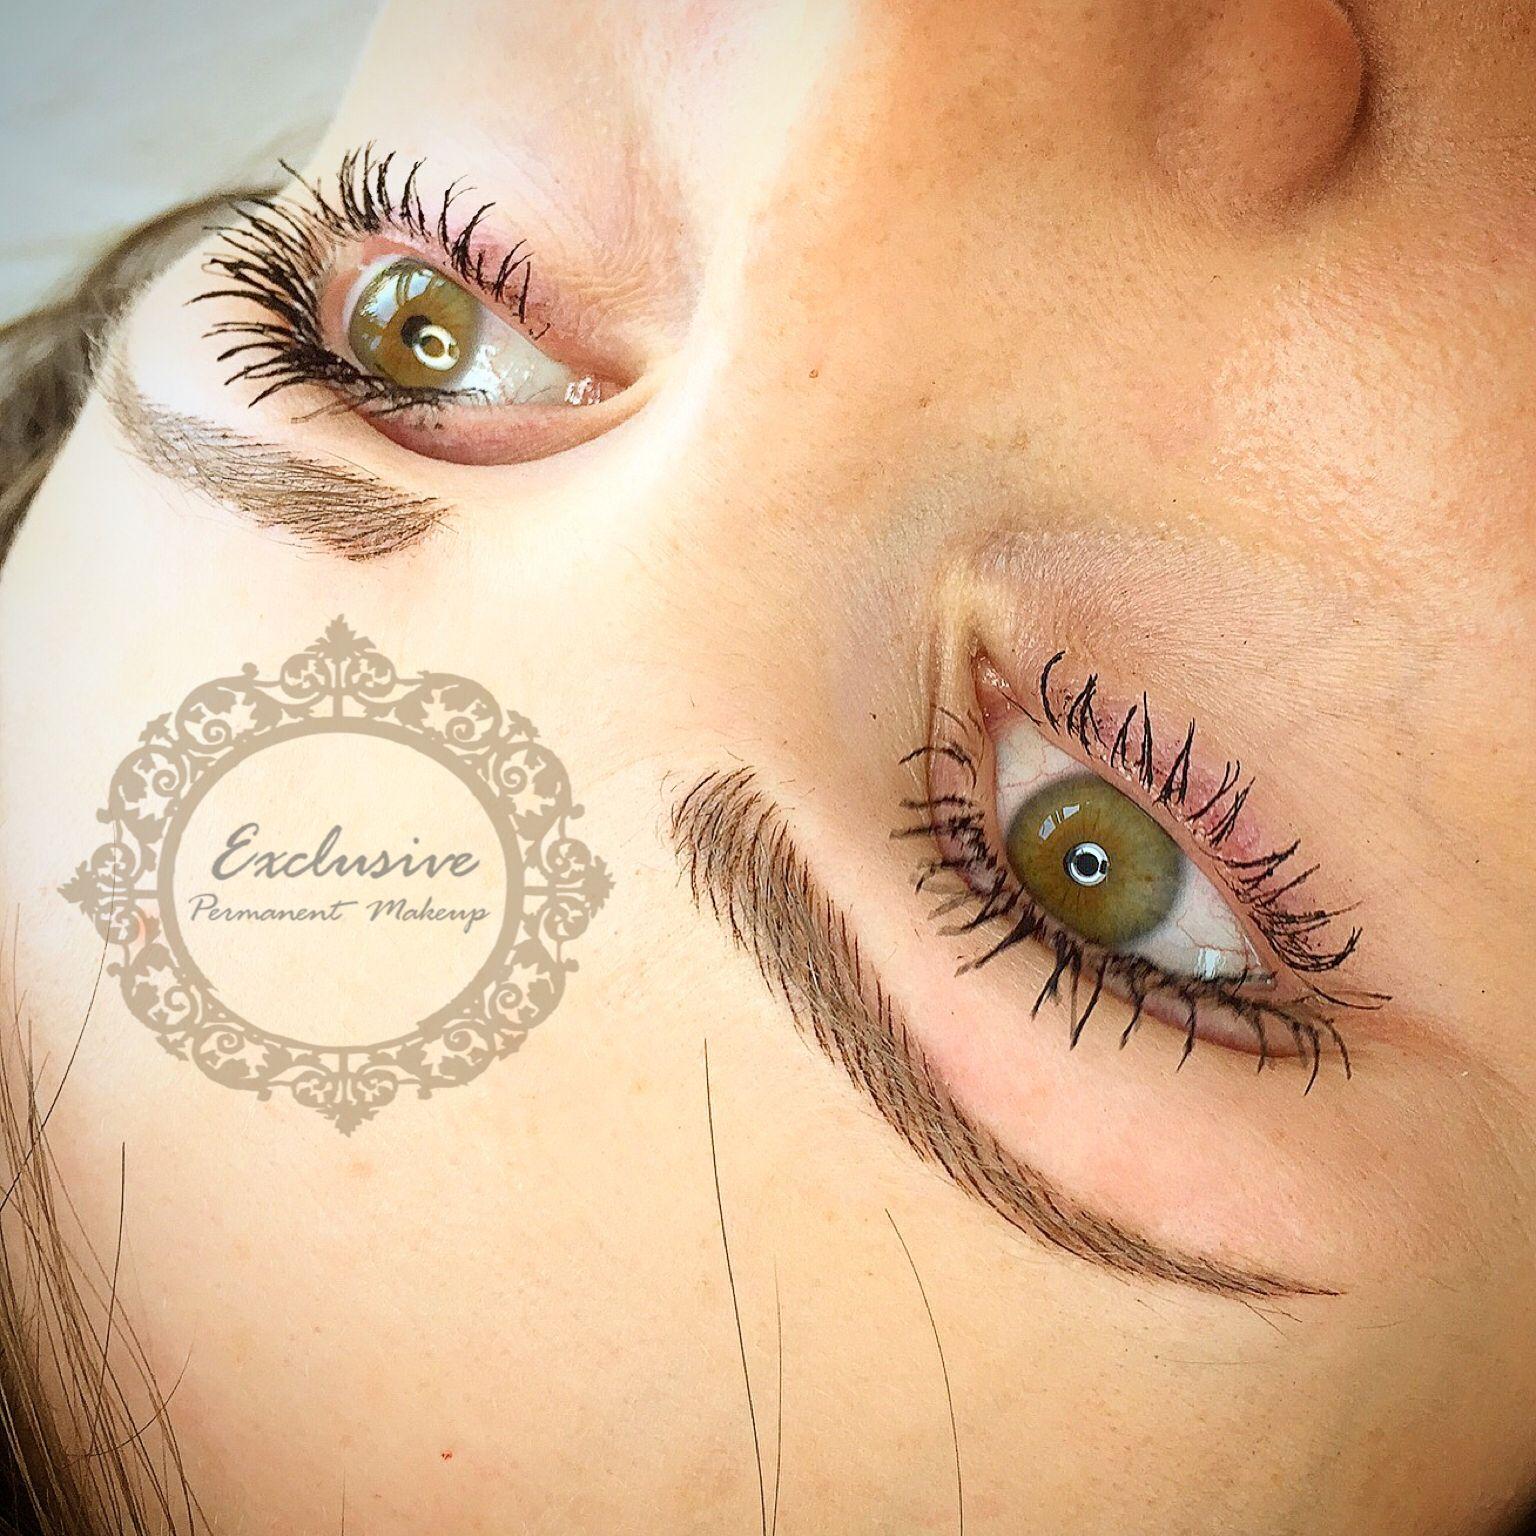 Microbladed Eyebrows Eyebrow tattoo, Eyebrows, Brows